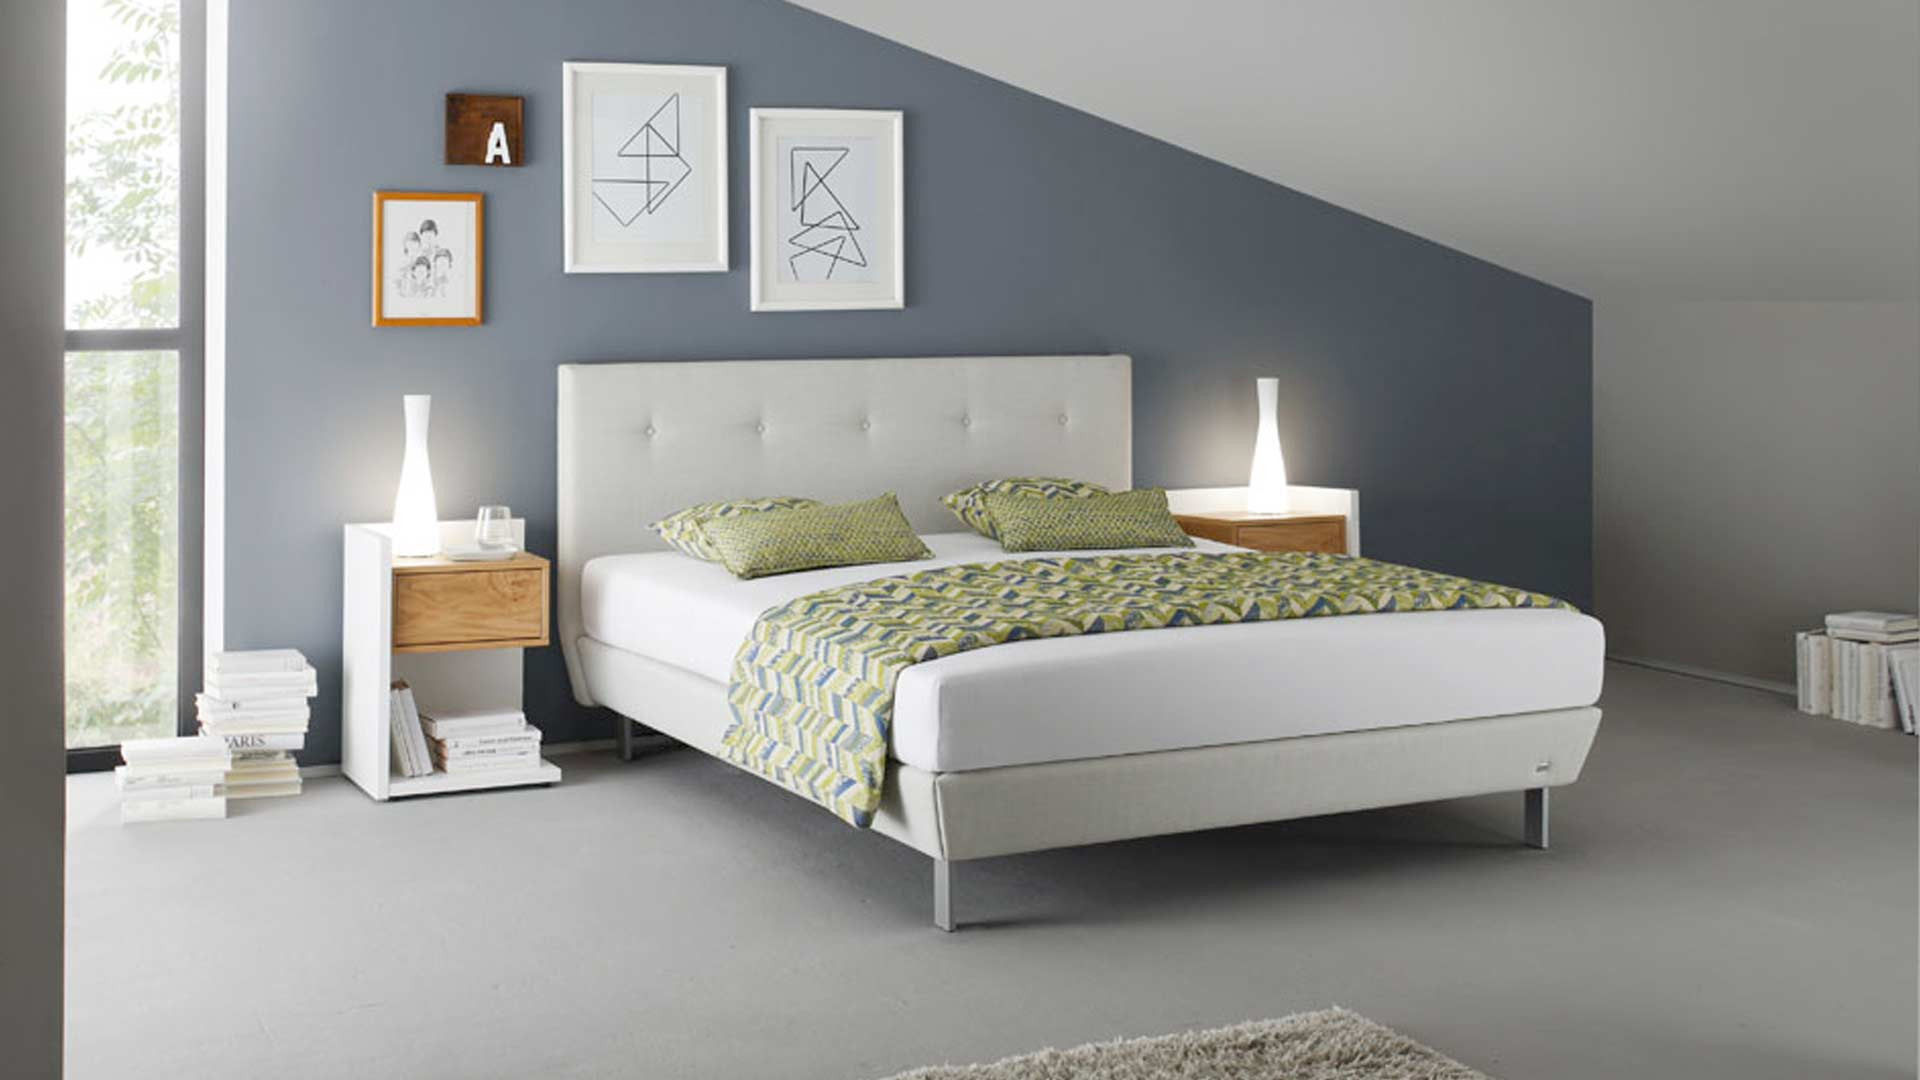 ostermann betten gallery of bett favola landhaus dam ltd co kg with ostermann betten latest. Black Bedroom Furniture Sets. Home Design Ideas